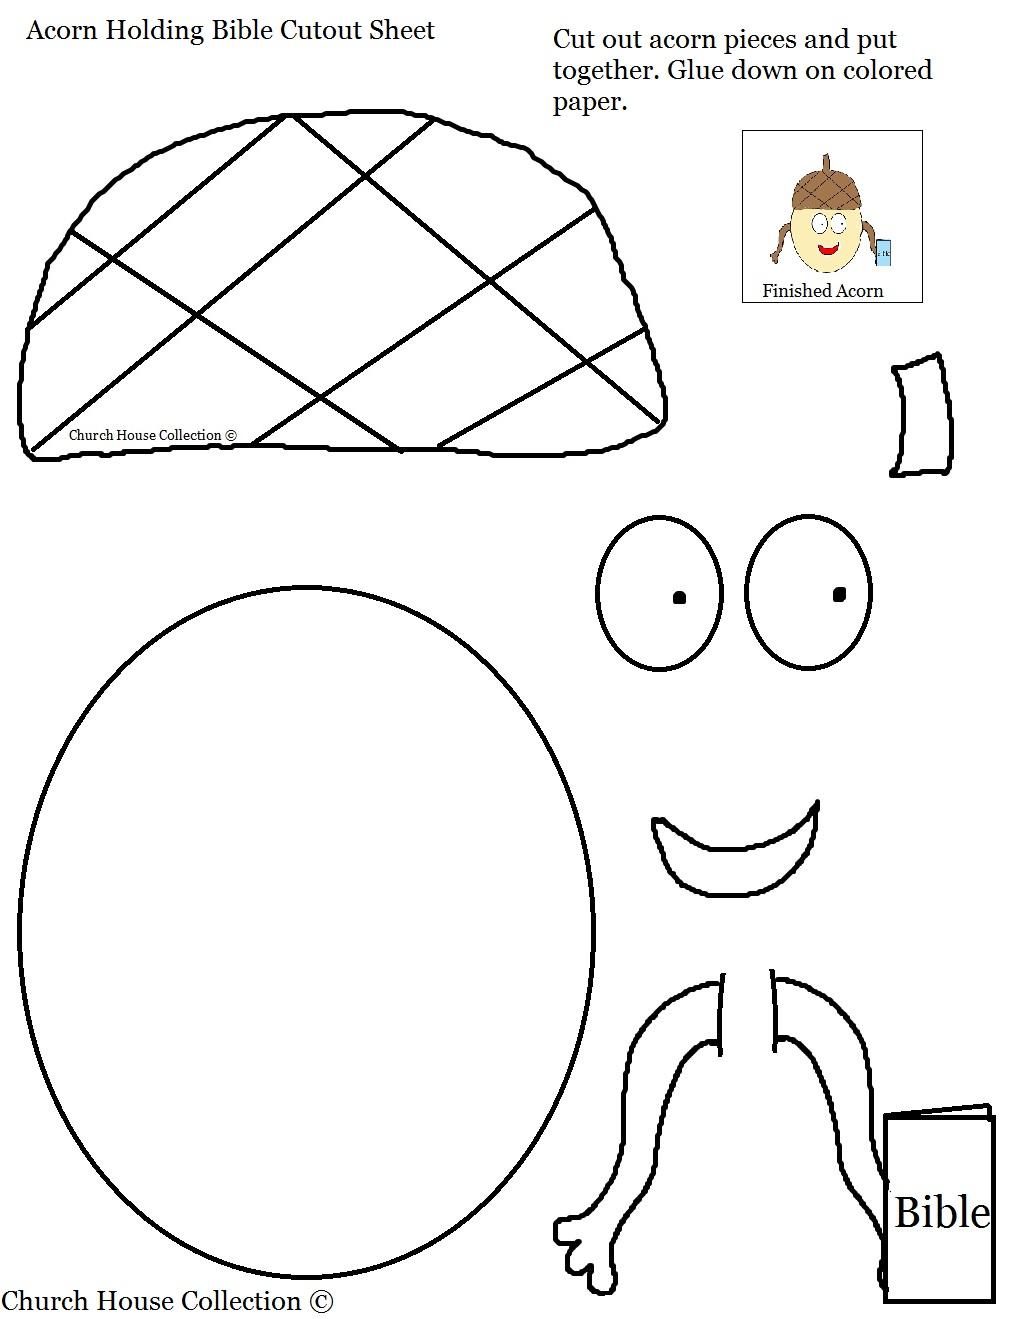 acorn holding bible cutout sheet for kids jpg